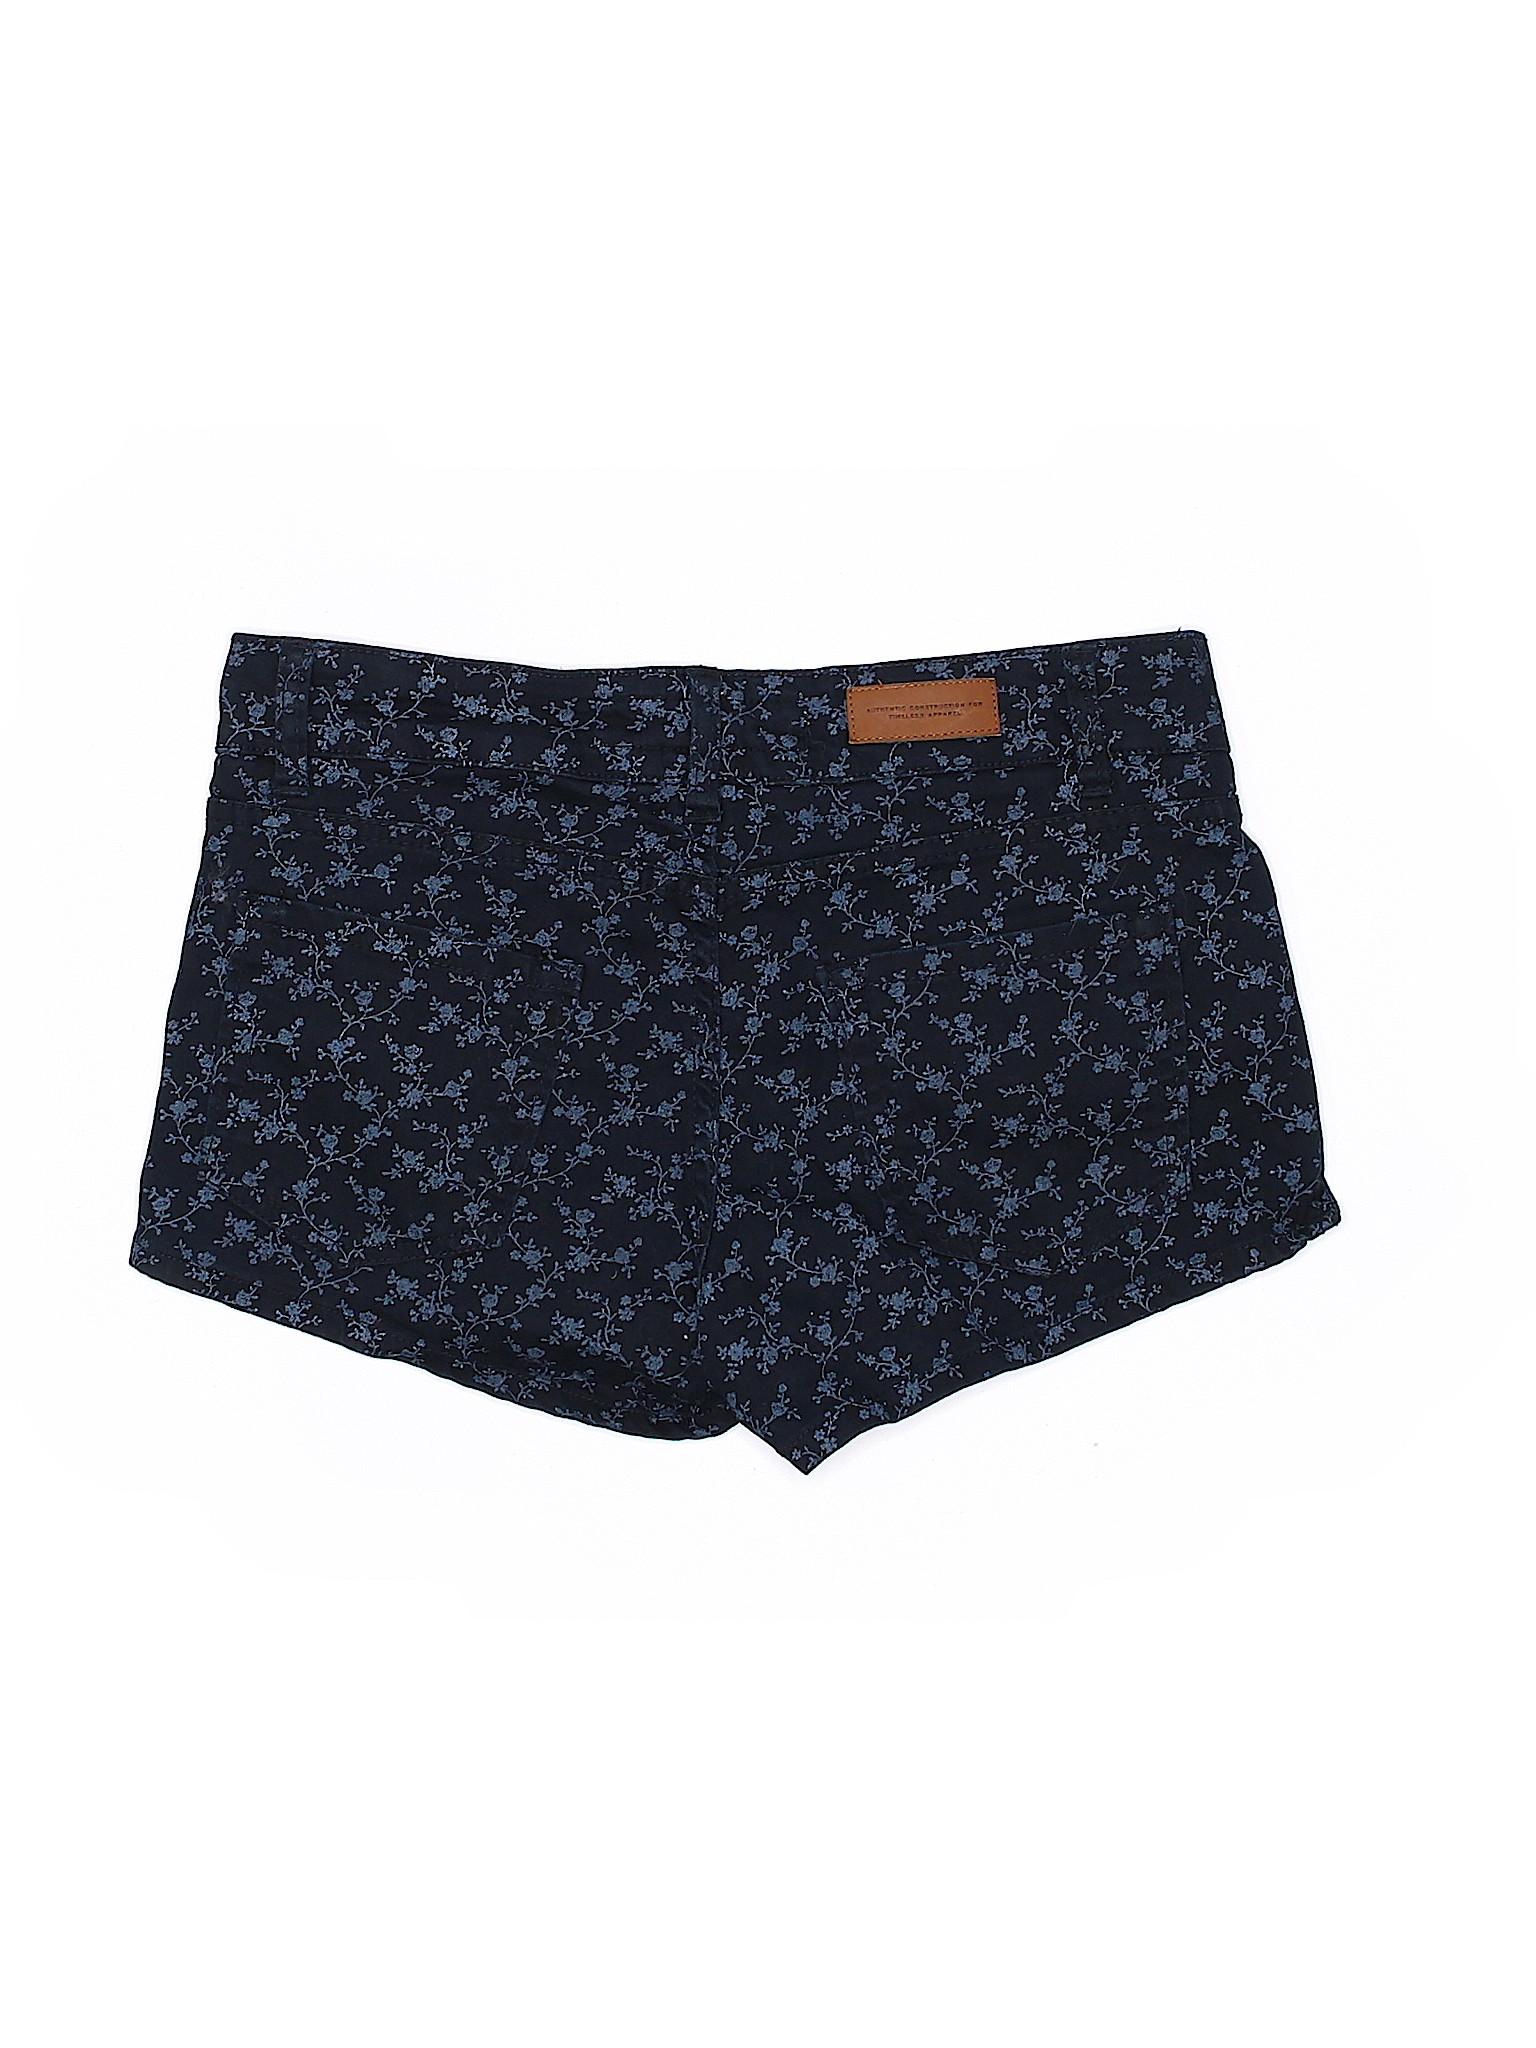 L G Shorts H Denim O G amp;M Boutique 0xawXqq